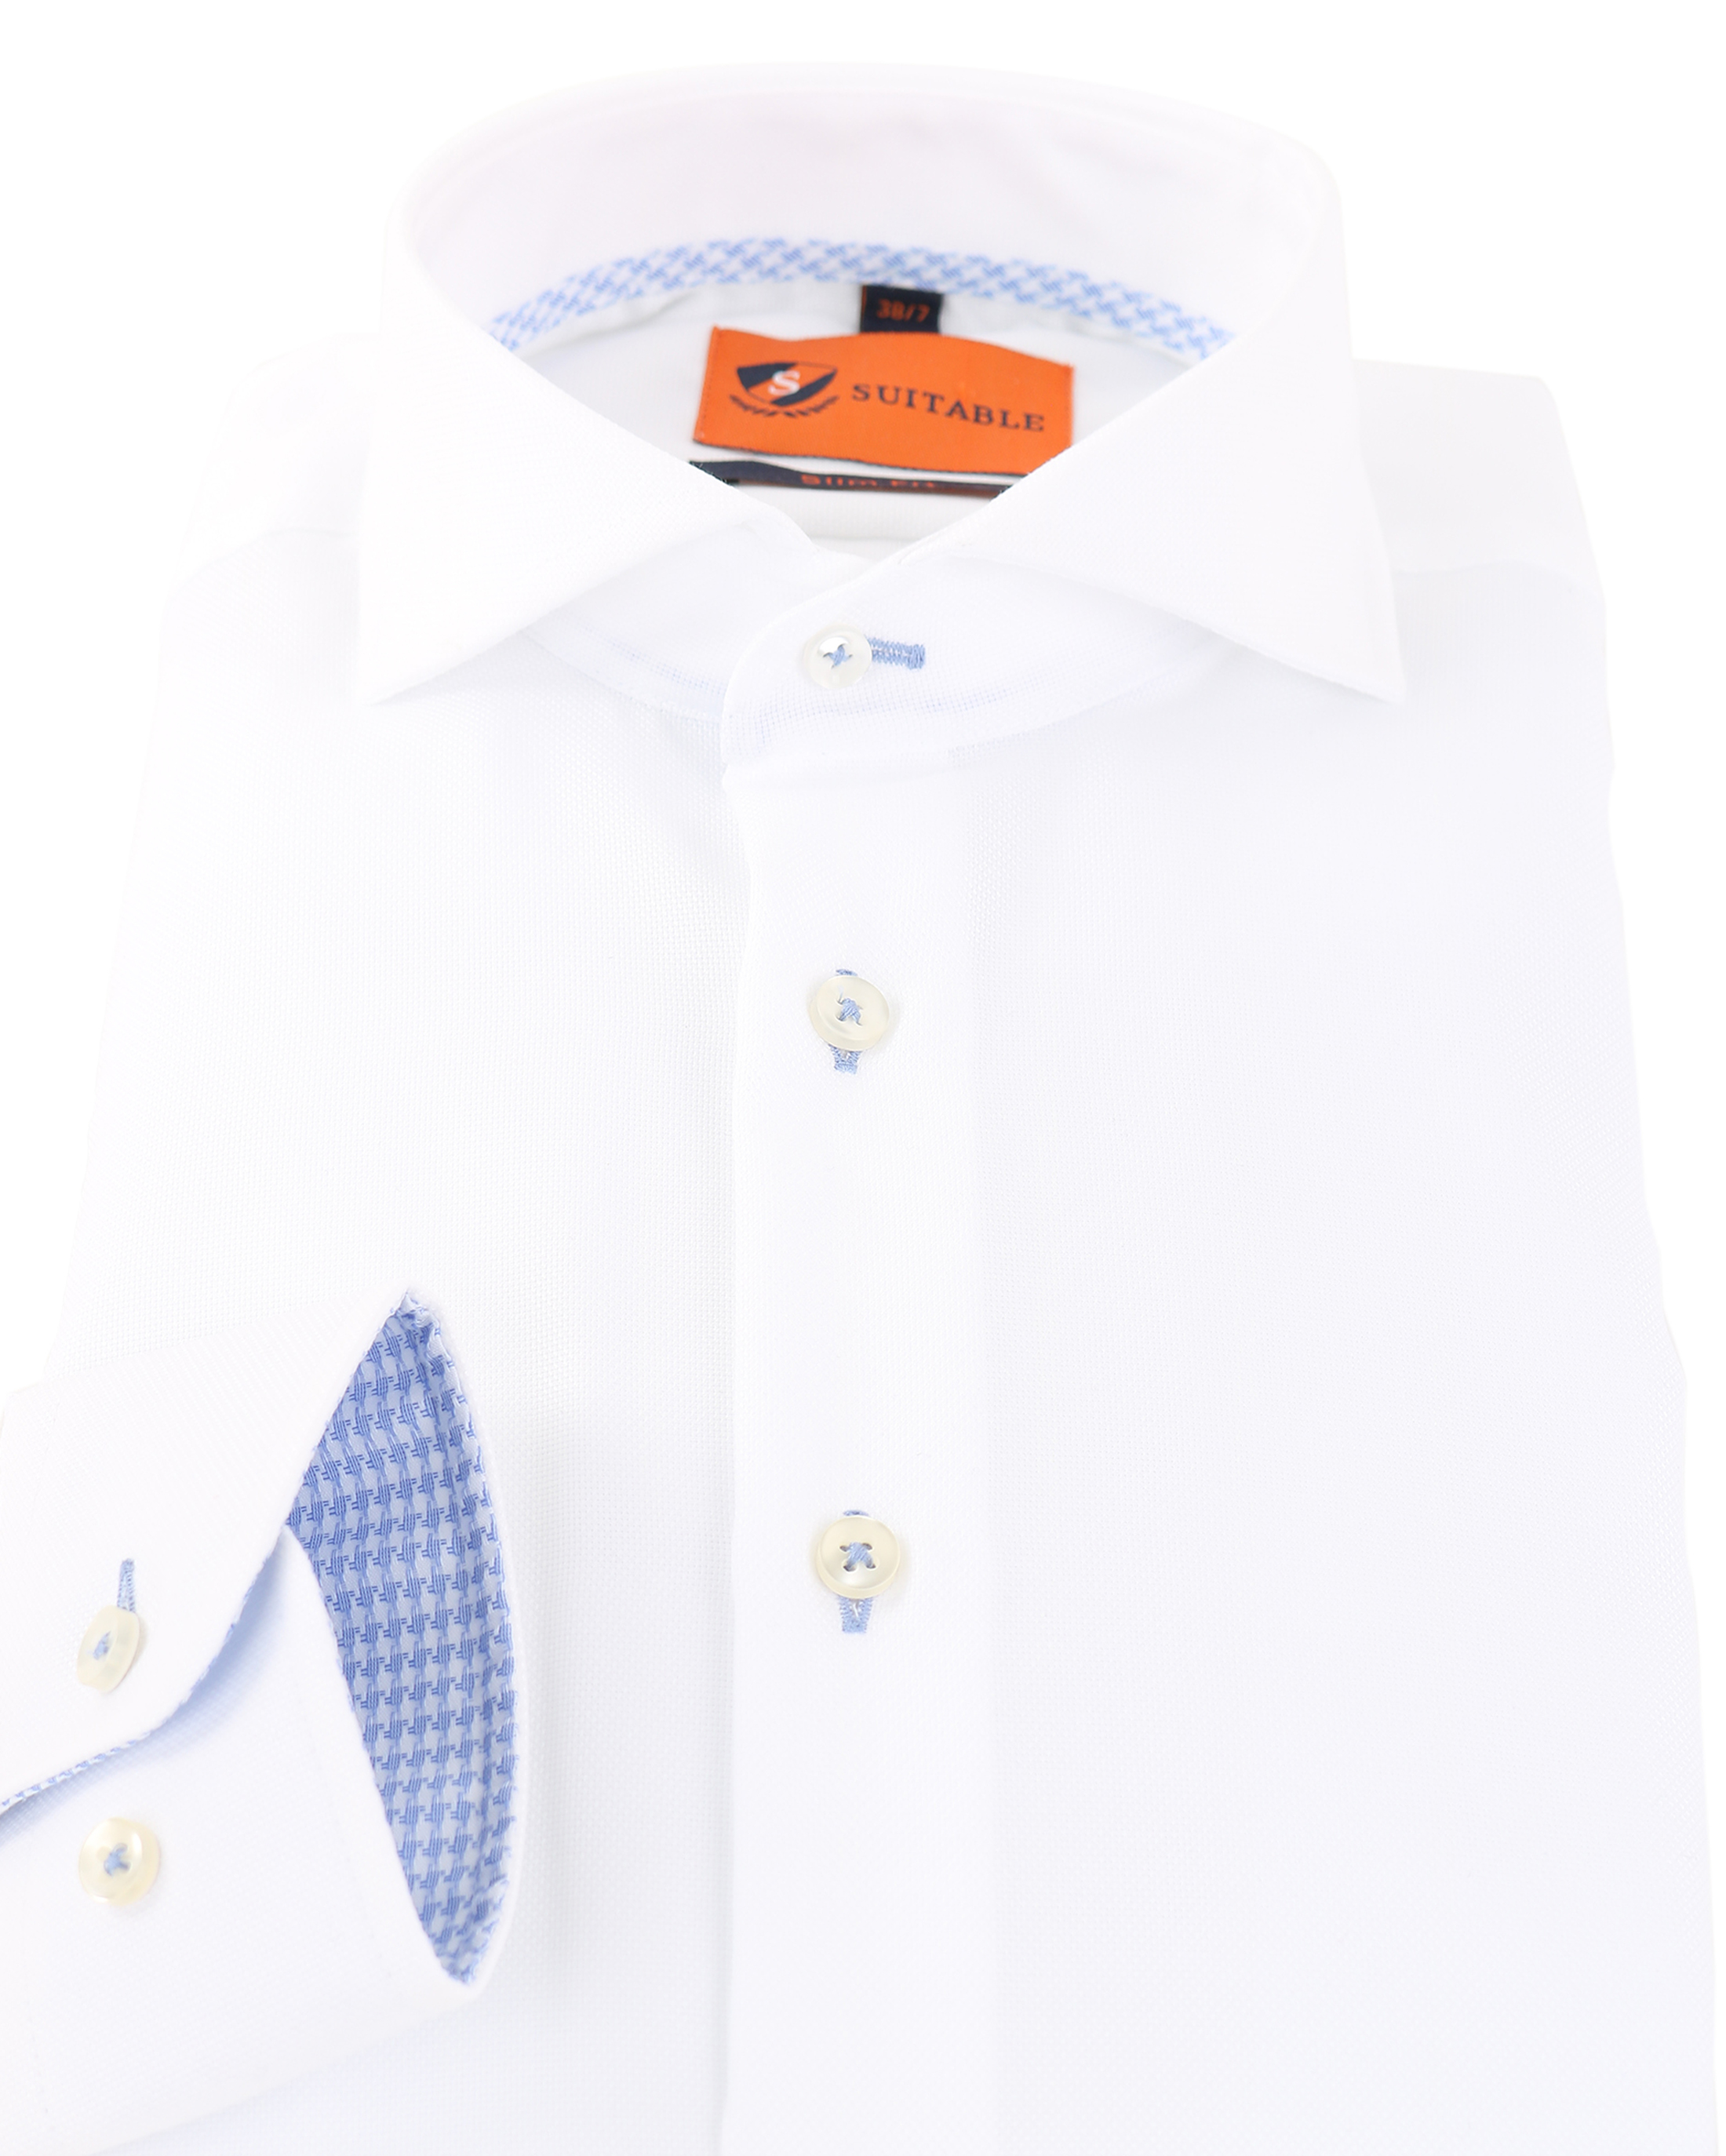 Mouwlengte 7 Overhemd Wit 150-1 foto 1